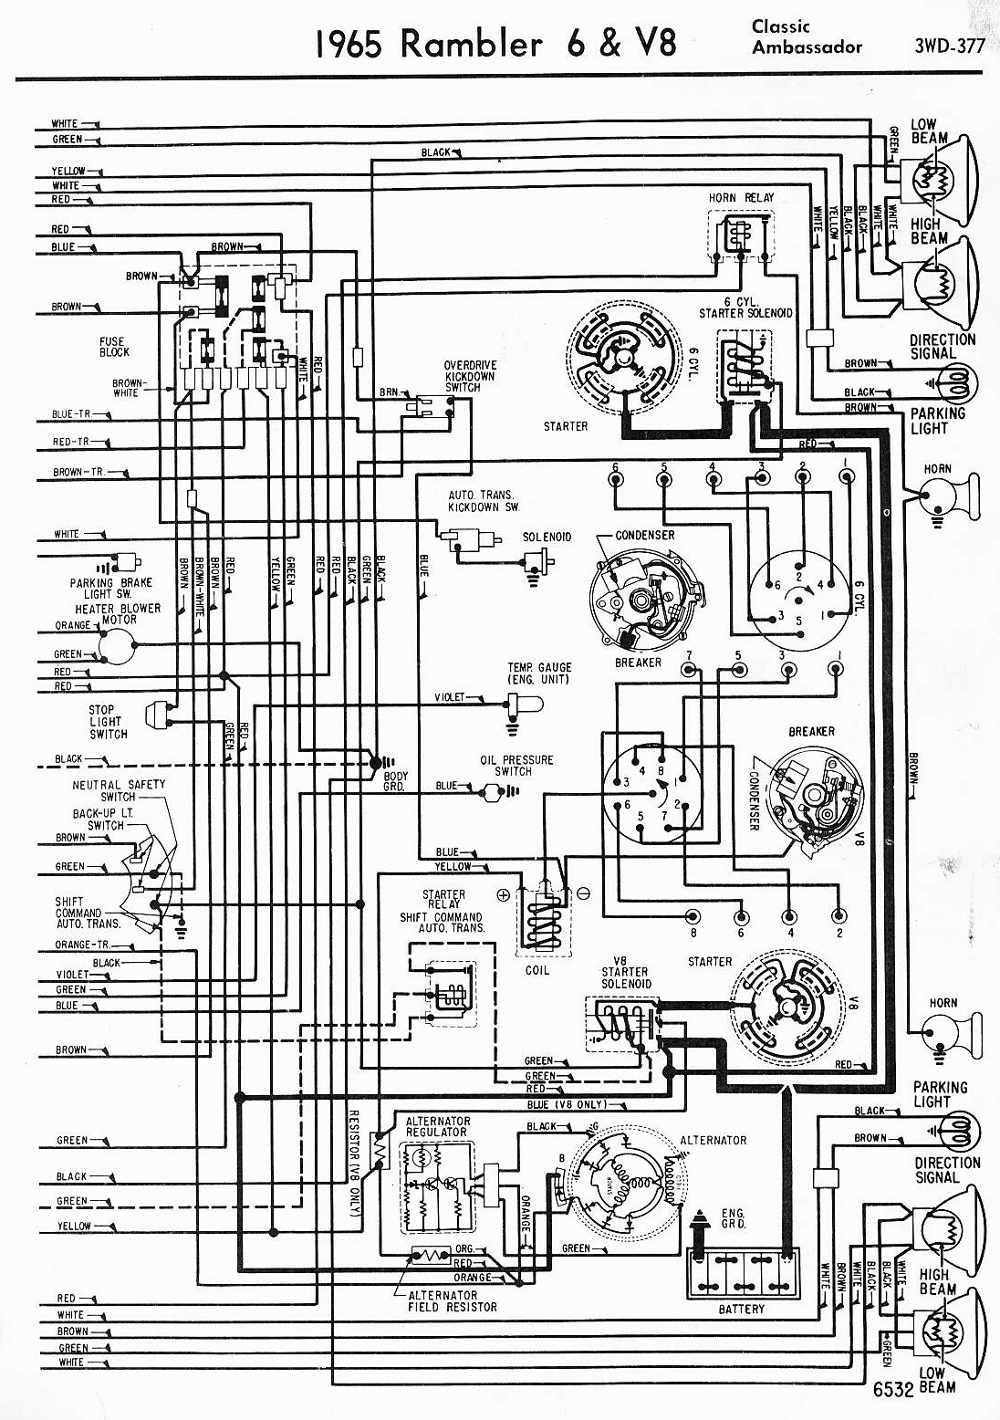 1974 amc amx wiring harness 1974 amc pacer wiring diagram 1974 amc ambassador 1973 amc [ 1000 x 1420 Pixel ]